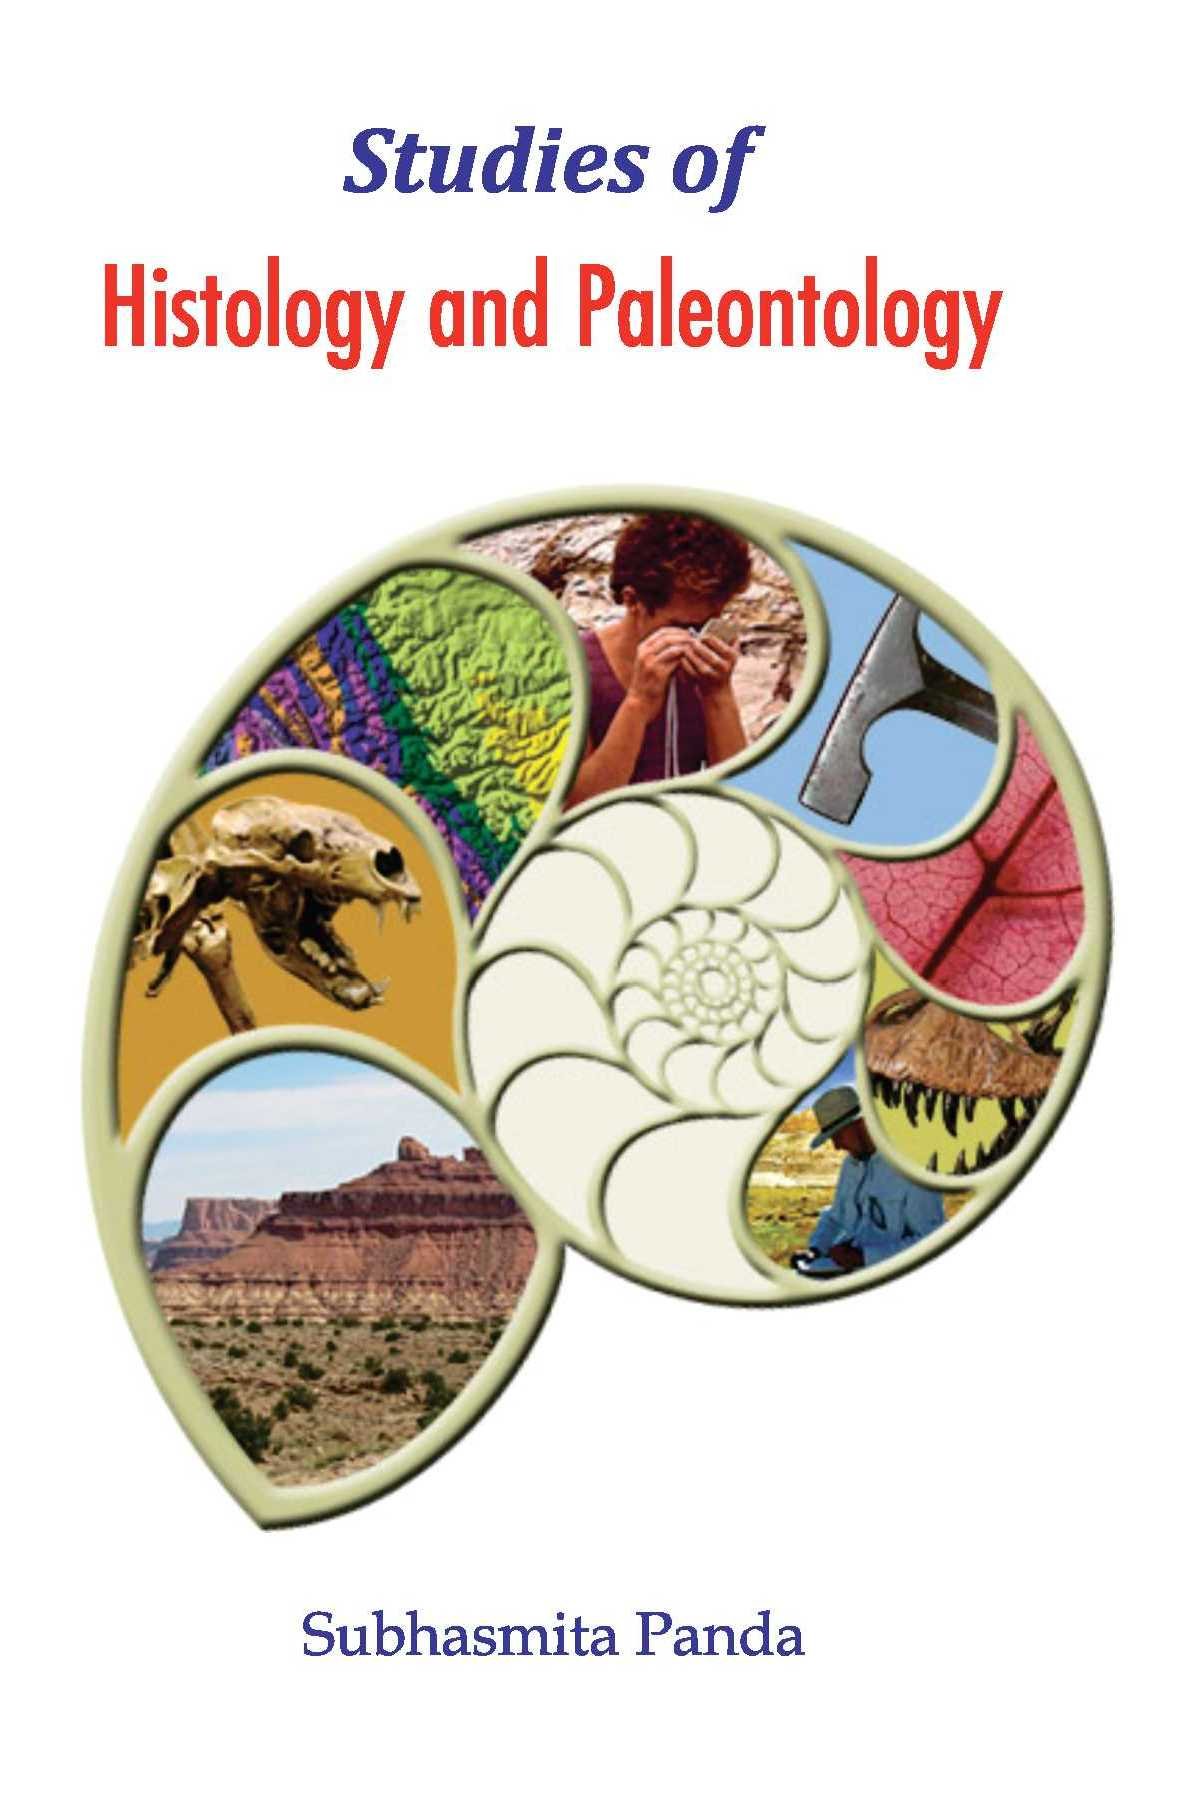 Studies of Histology and Paleontology